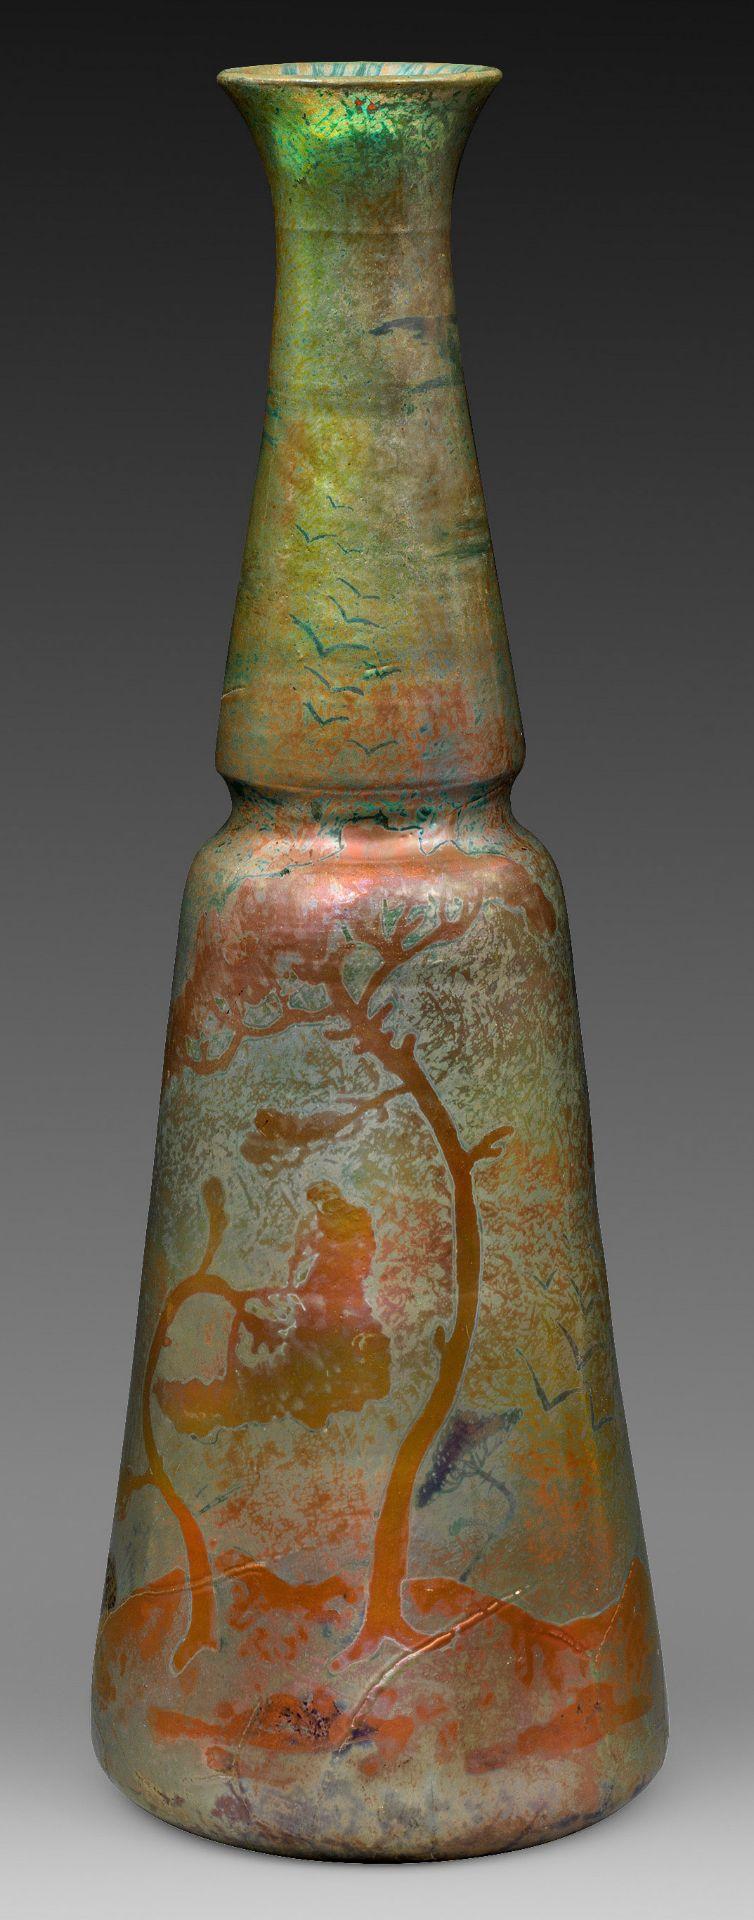 Große Jugendstil-Vase mit Landschaft von Dominique Zumbo